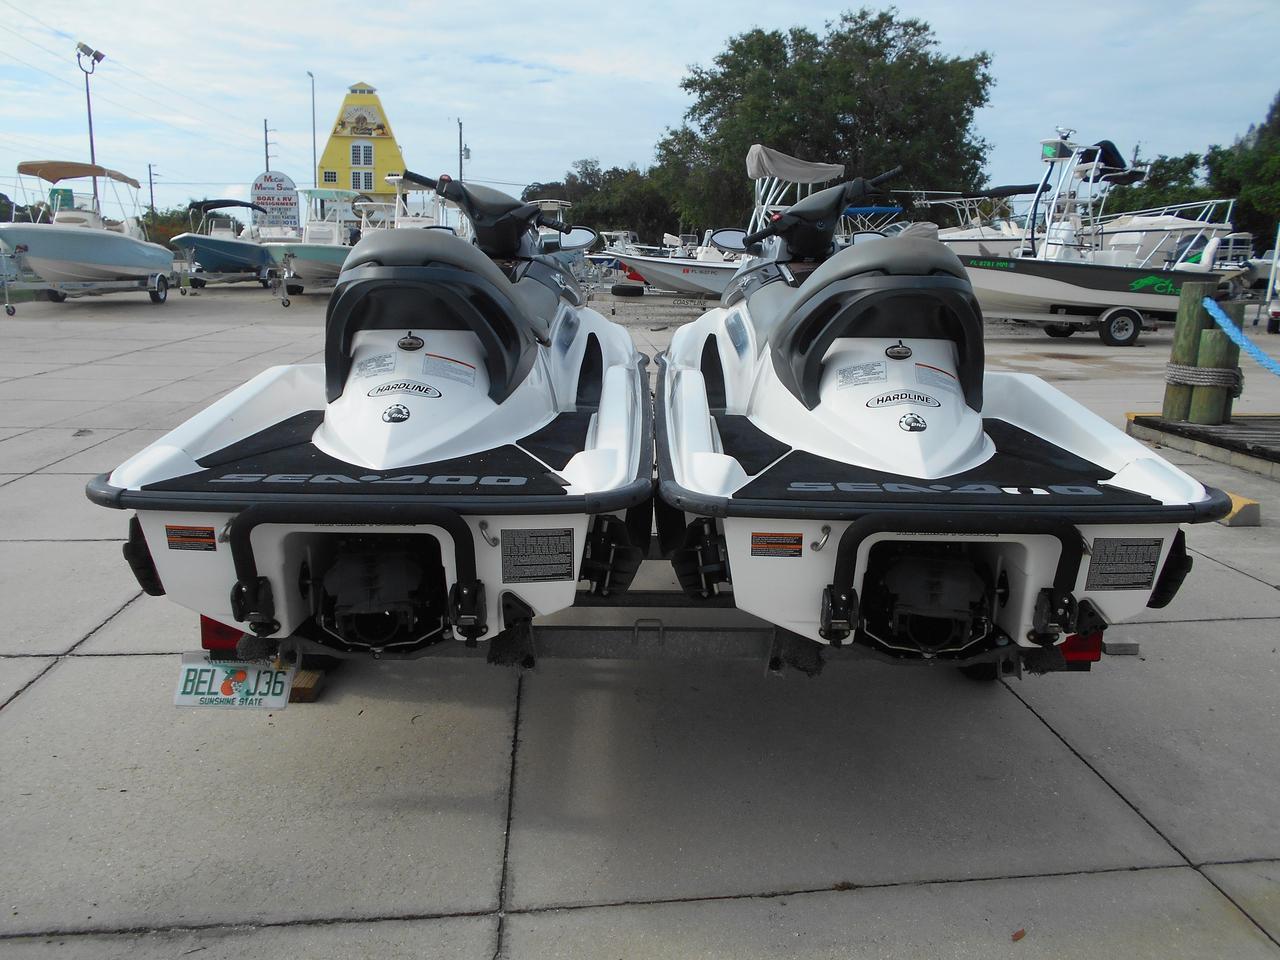 2006 Used Sea-Doo GTX 4-tec High Performance Boat For Sale - $11,995